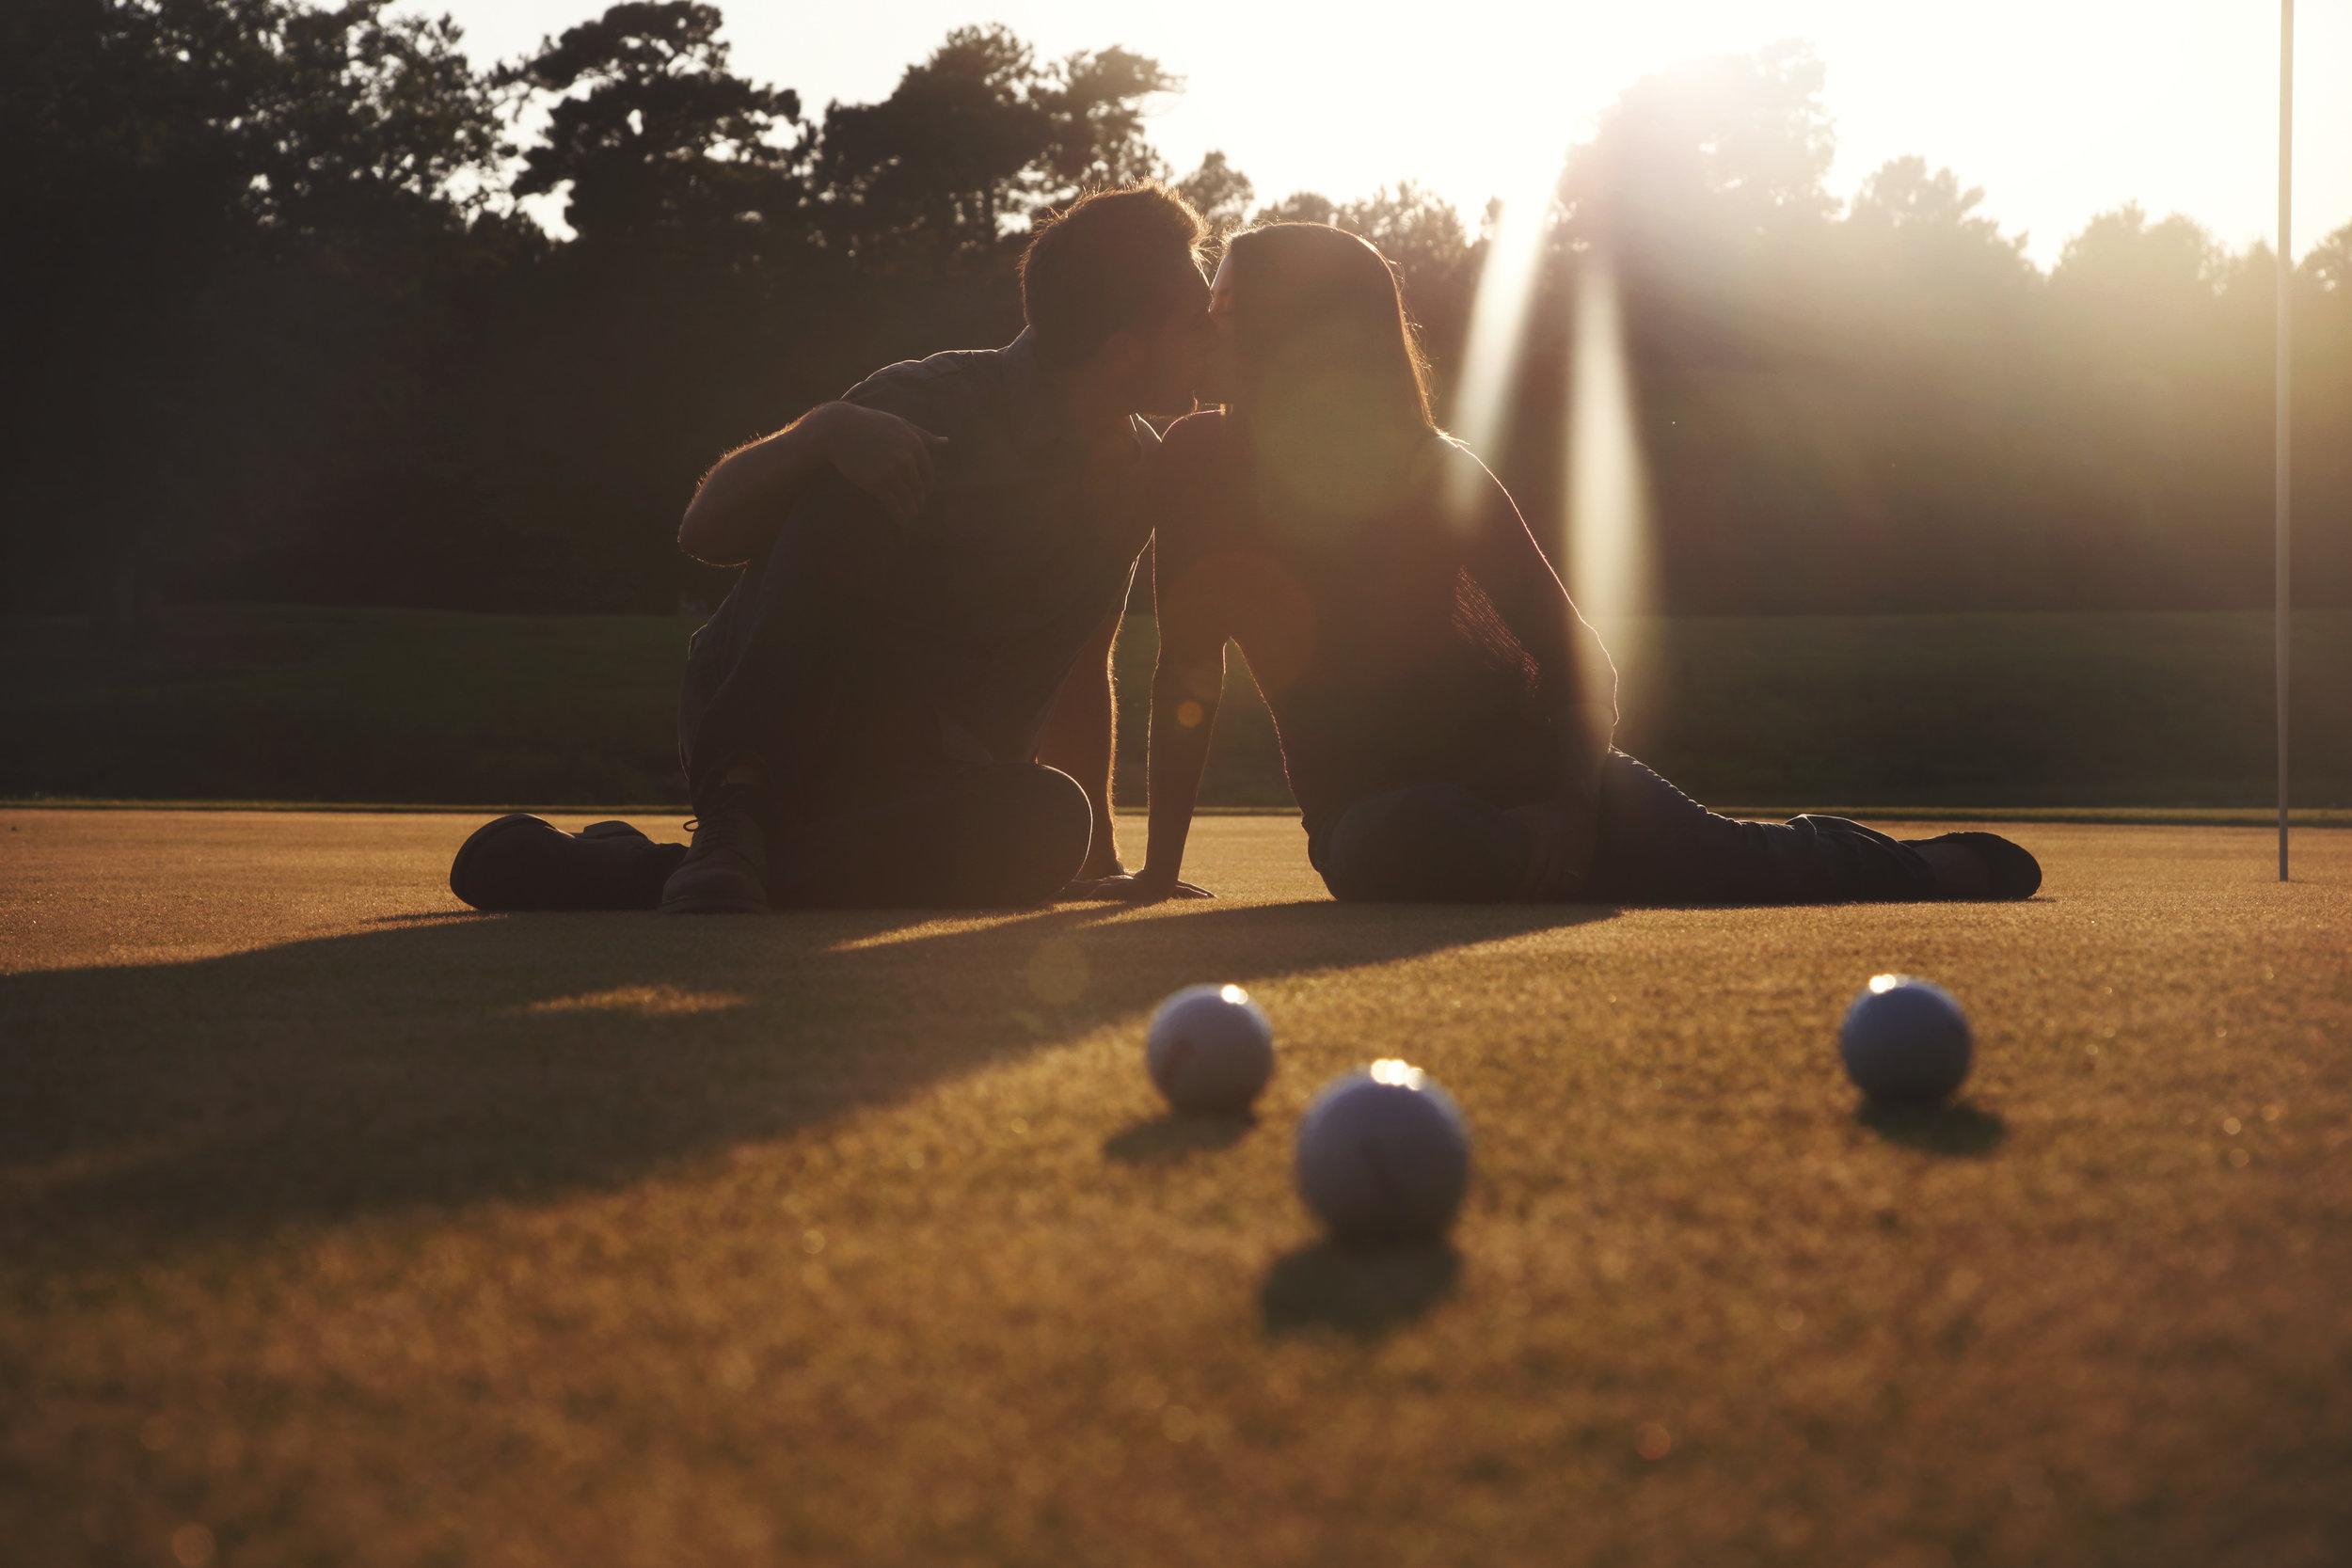 golfcourseengagmenetshoot.jpg